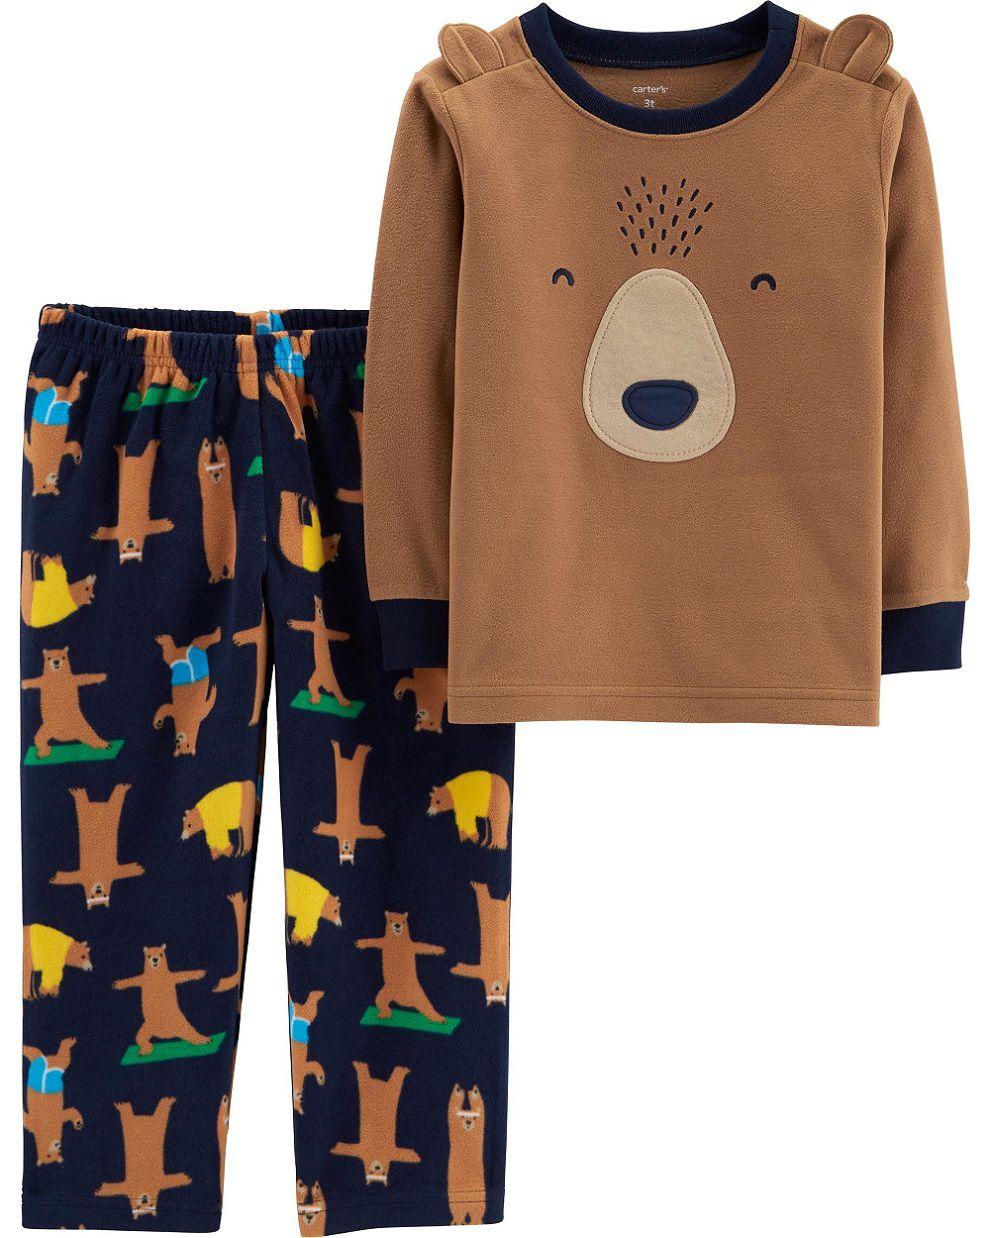 b272d01f3 Pijama Carters - Fleece - 18 Meses - 14948110 - Le Petite Baby Store ...